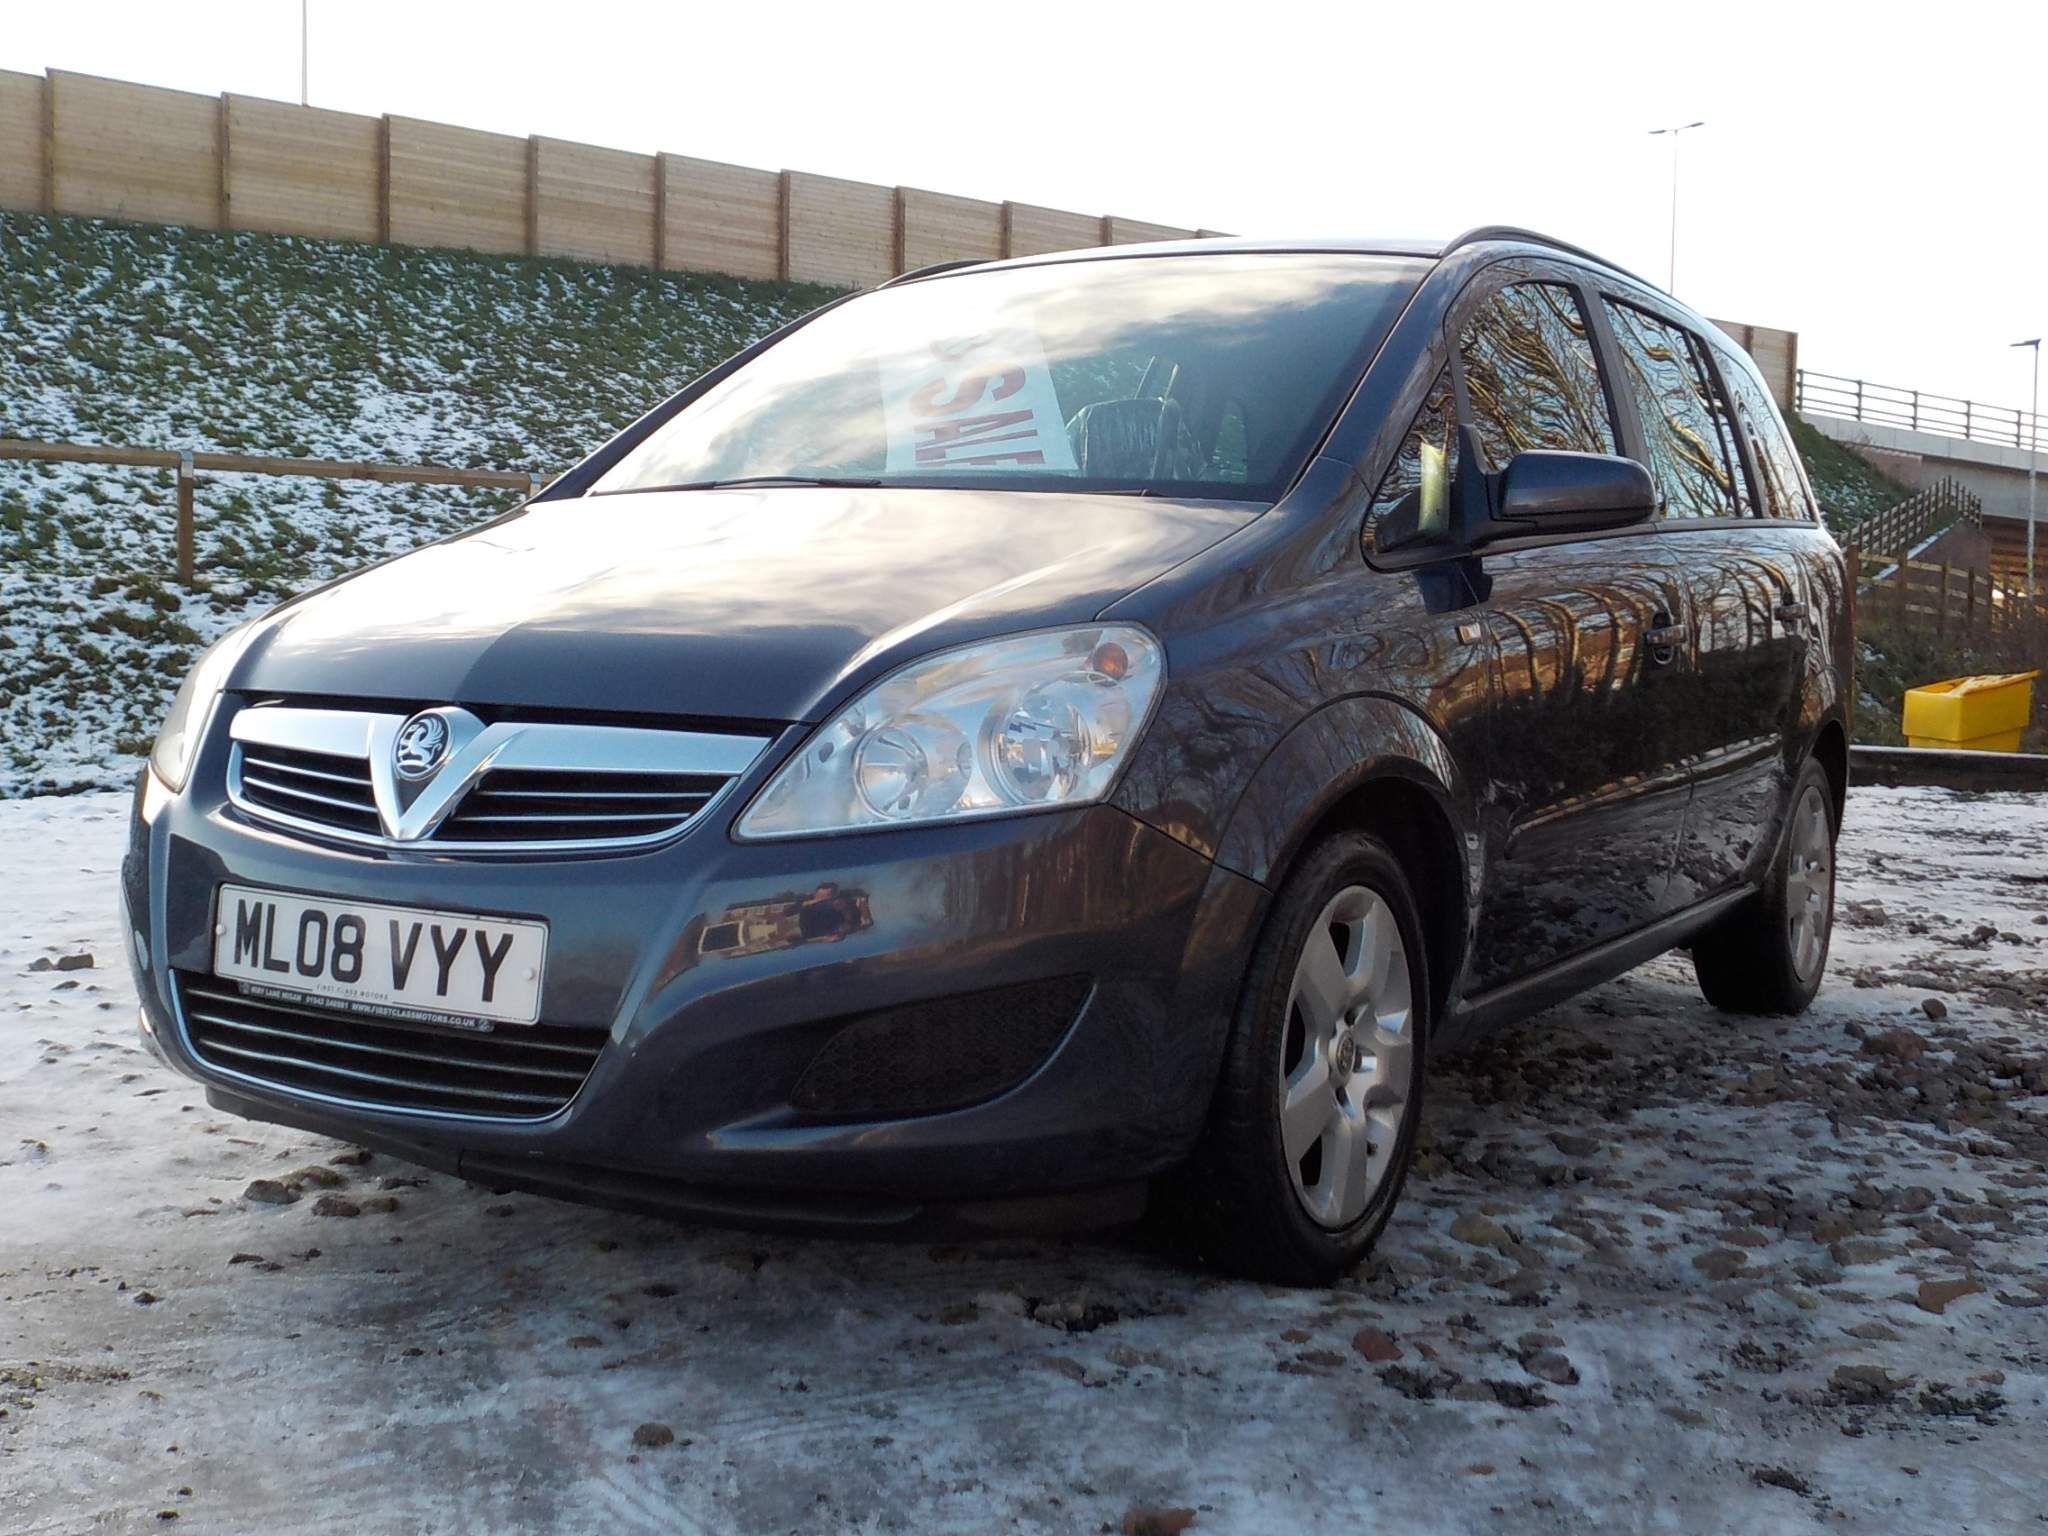 Vauxhall Zafira 1.8 i 16v Exclusiv 5dr